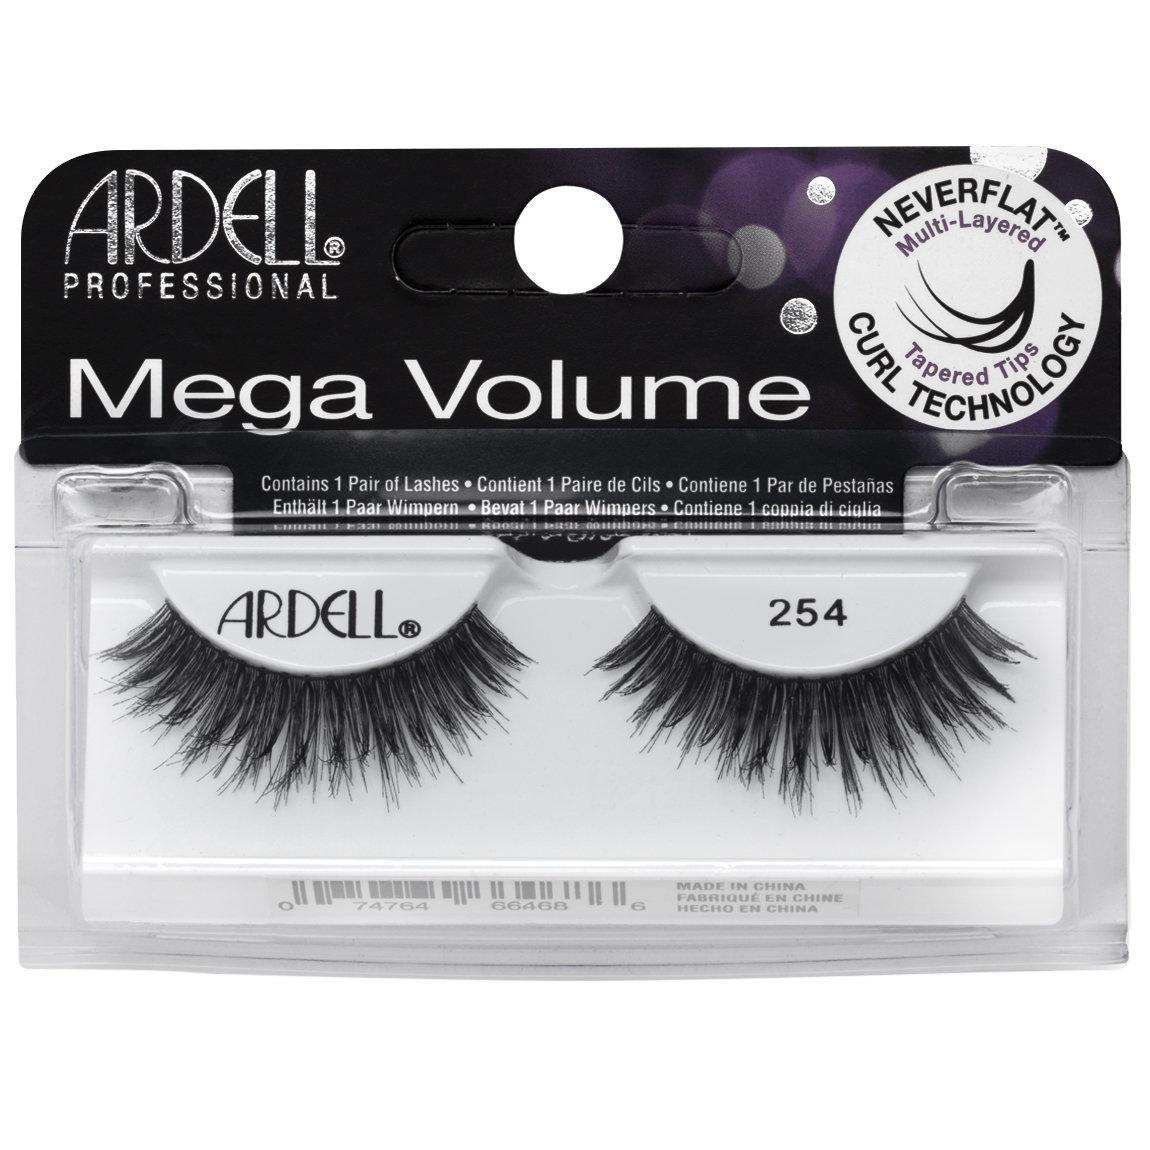 Ardell Mega Volume Lashes 254